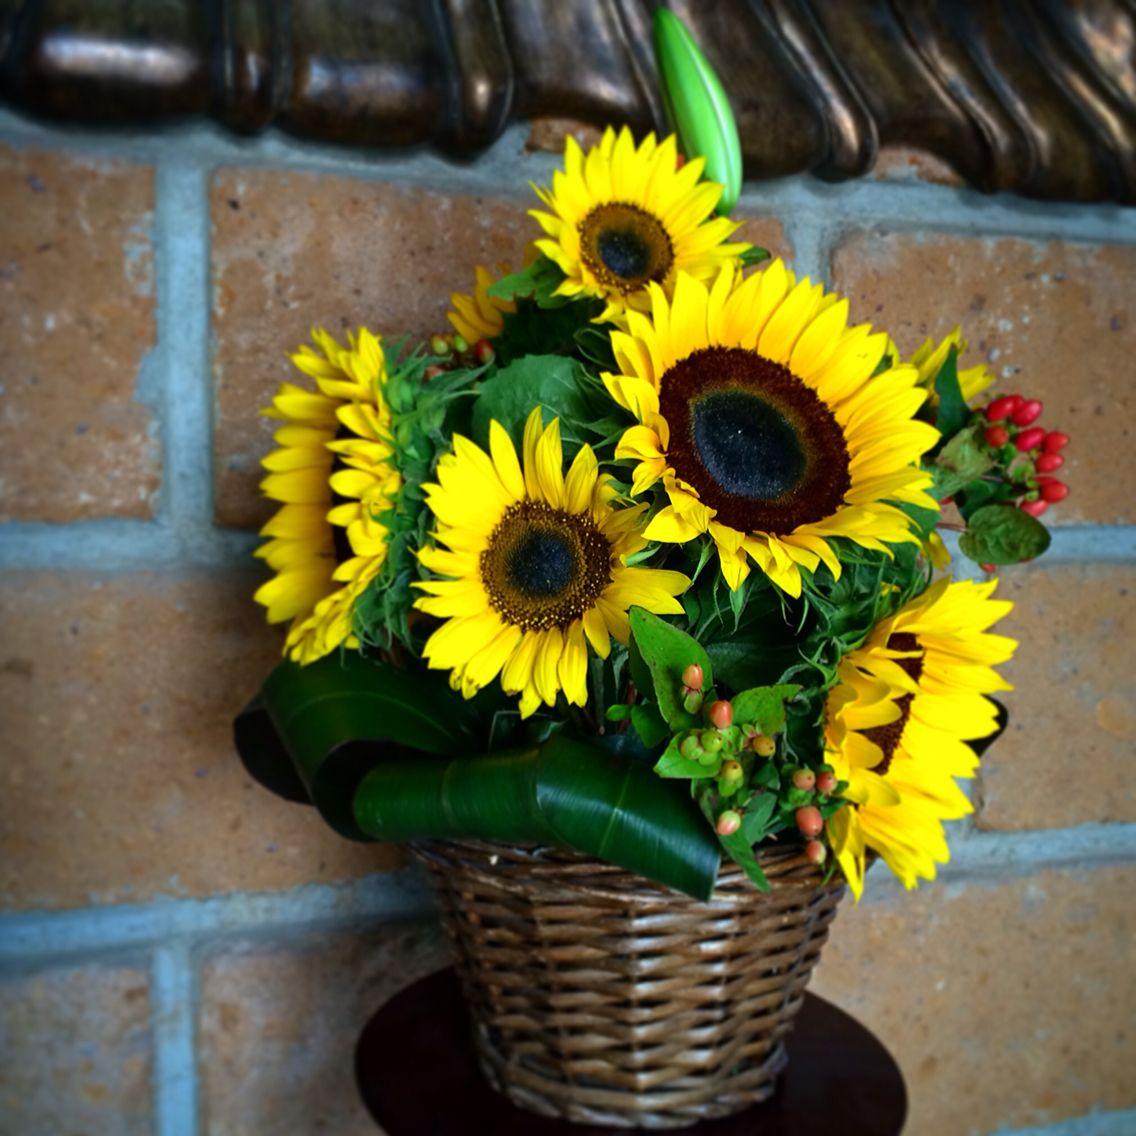 sunflowers basket canasta de girasoles casa di fiori arreglo de flores flowers